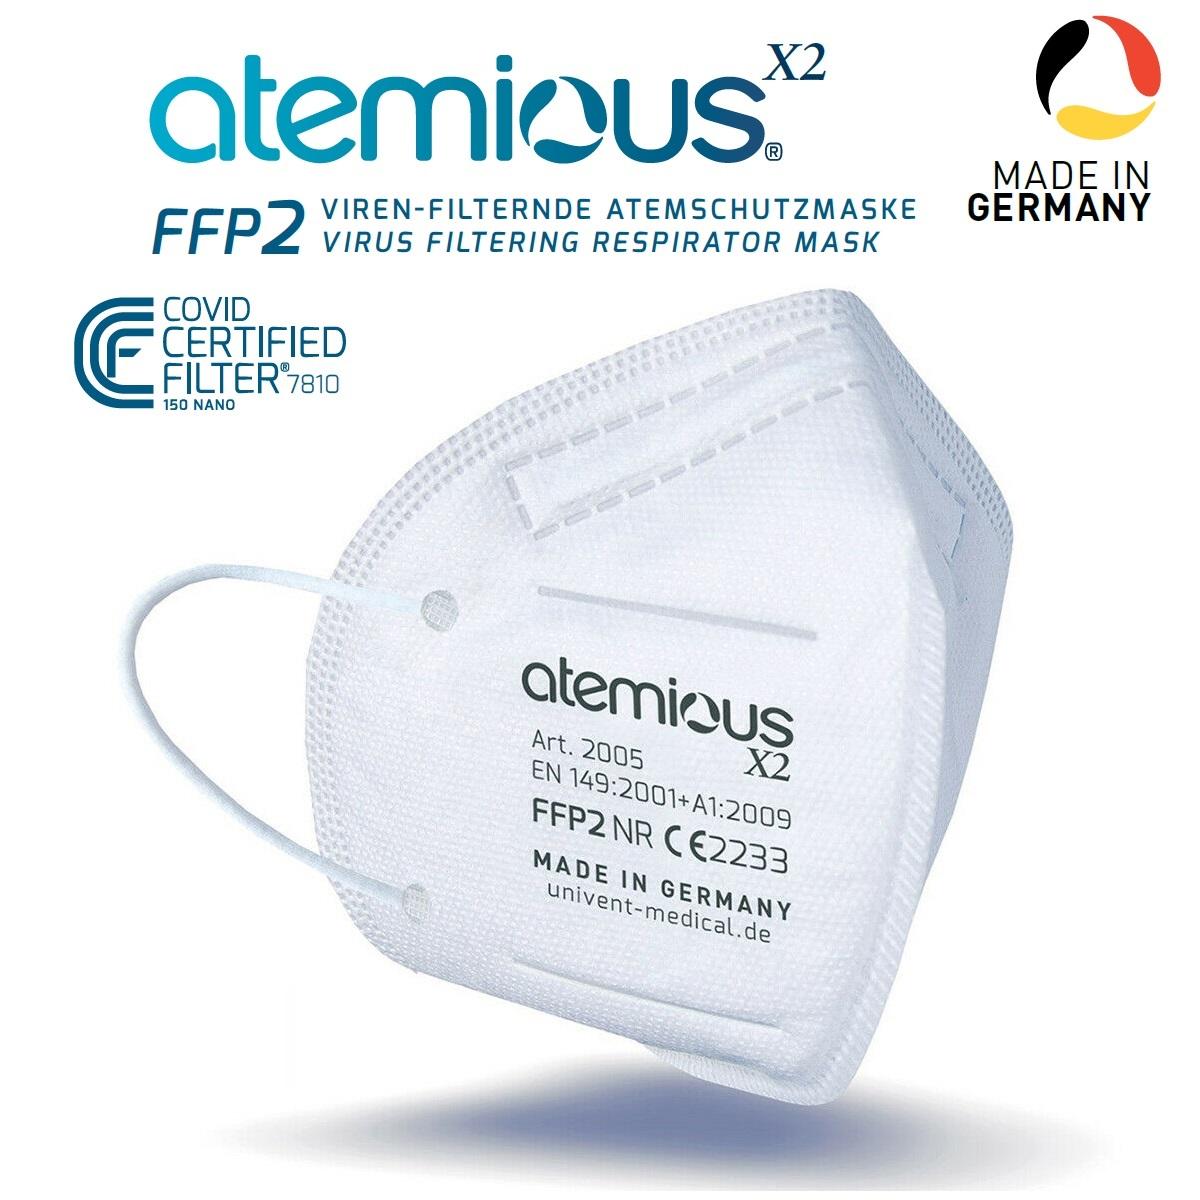 Atemious X2 Atemschutzmask, Made in Germany